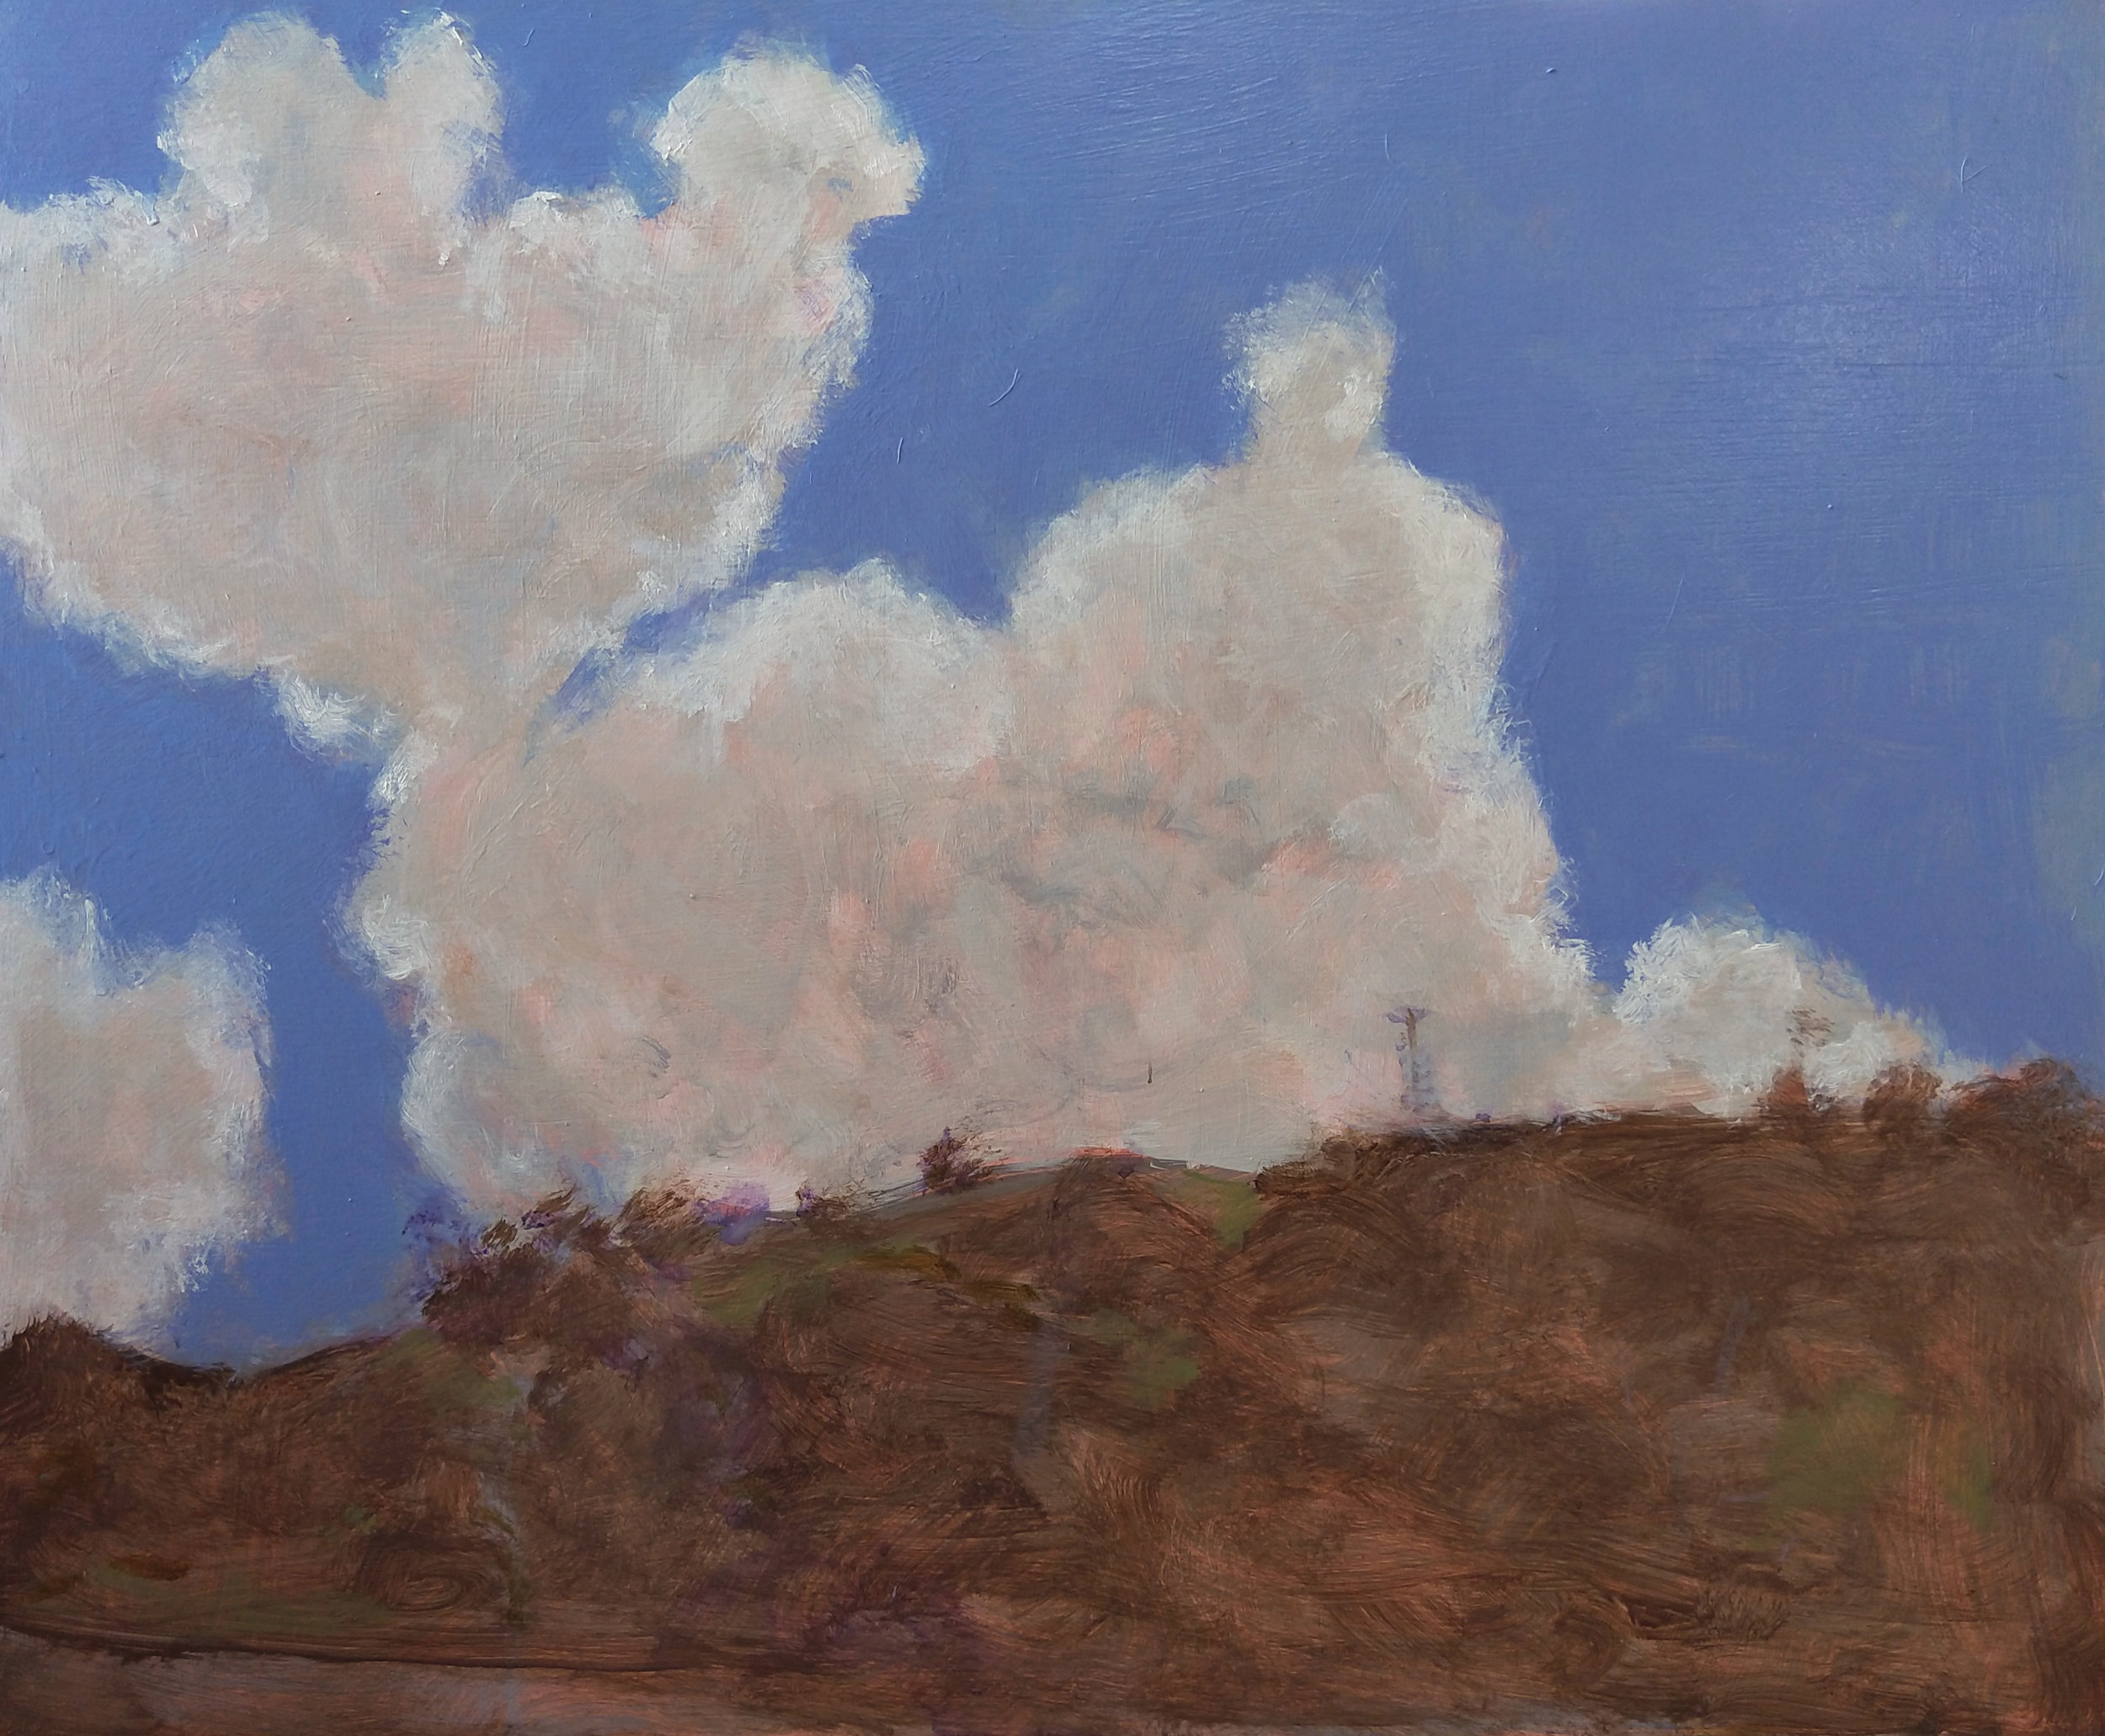 High Cloud. 2019. Acrylic on birch wood panel. 50 x 60 cm.$3,500